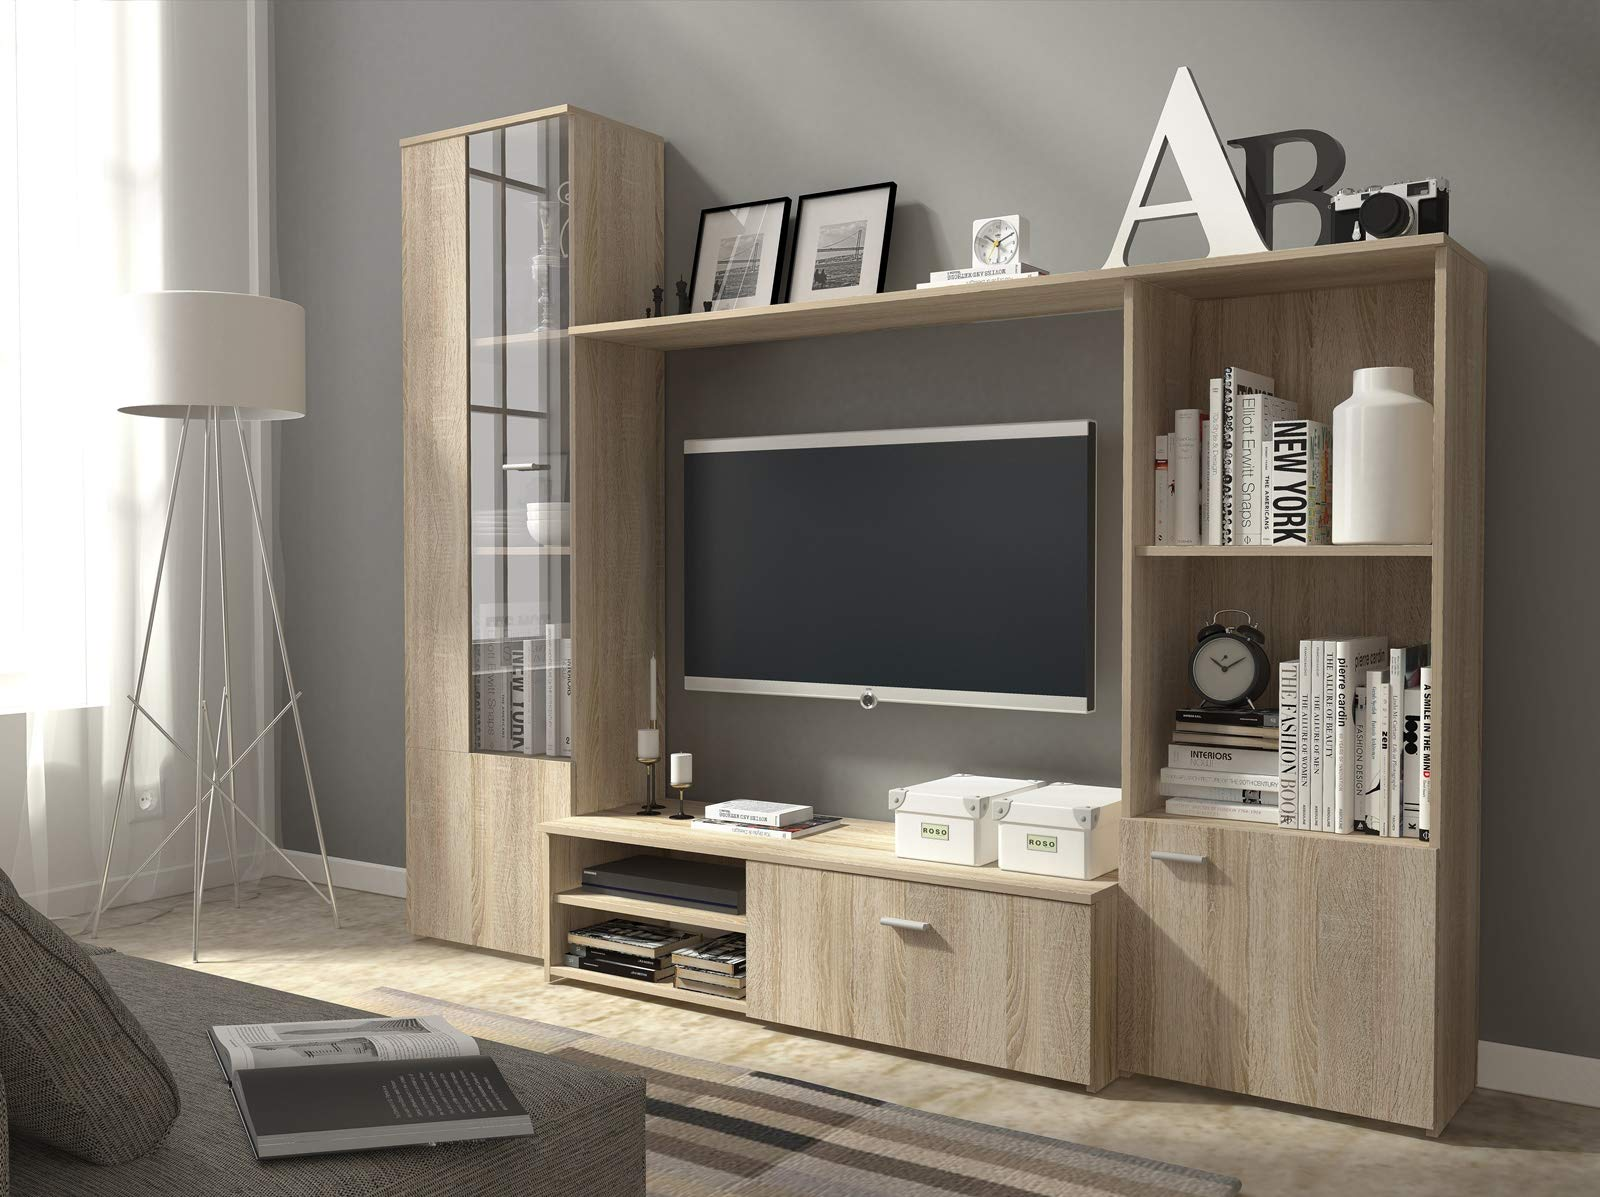 tv wall units for living room amazon co uk rh amazon co uk wall units living room uk wall units living room